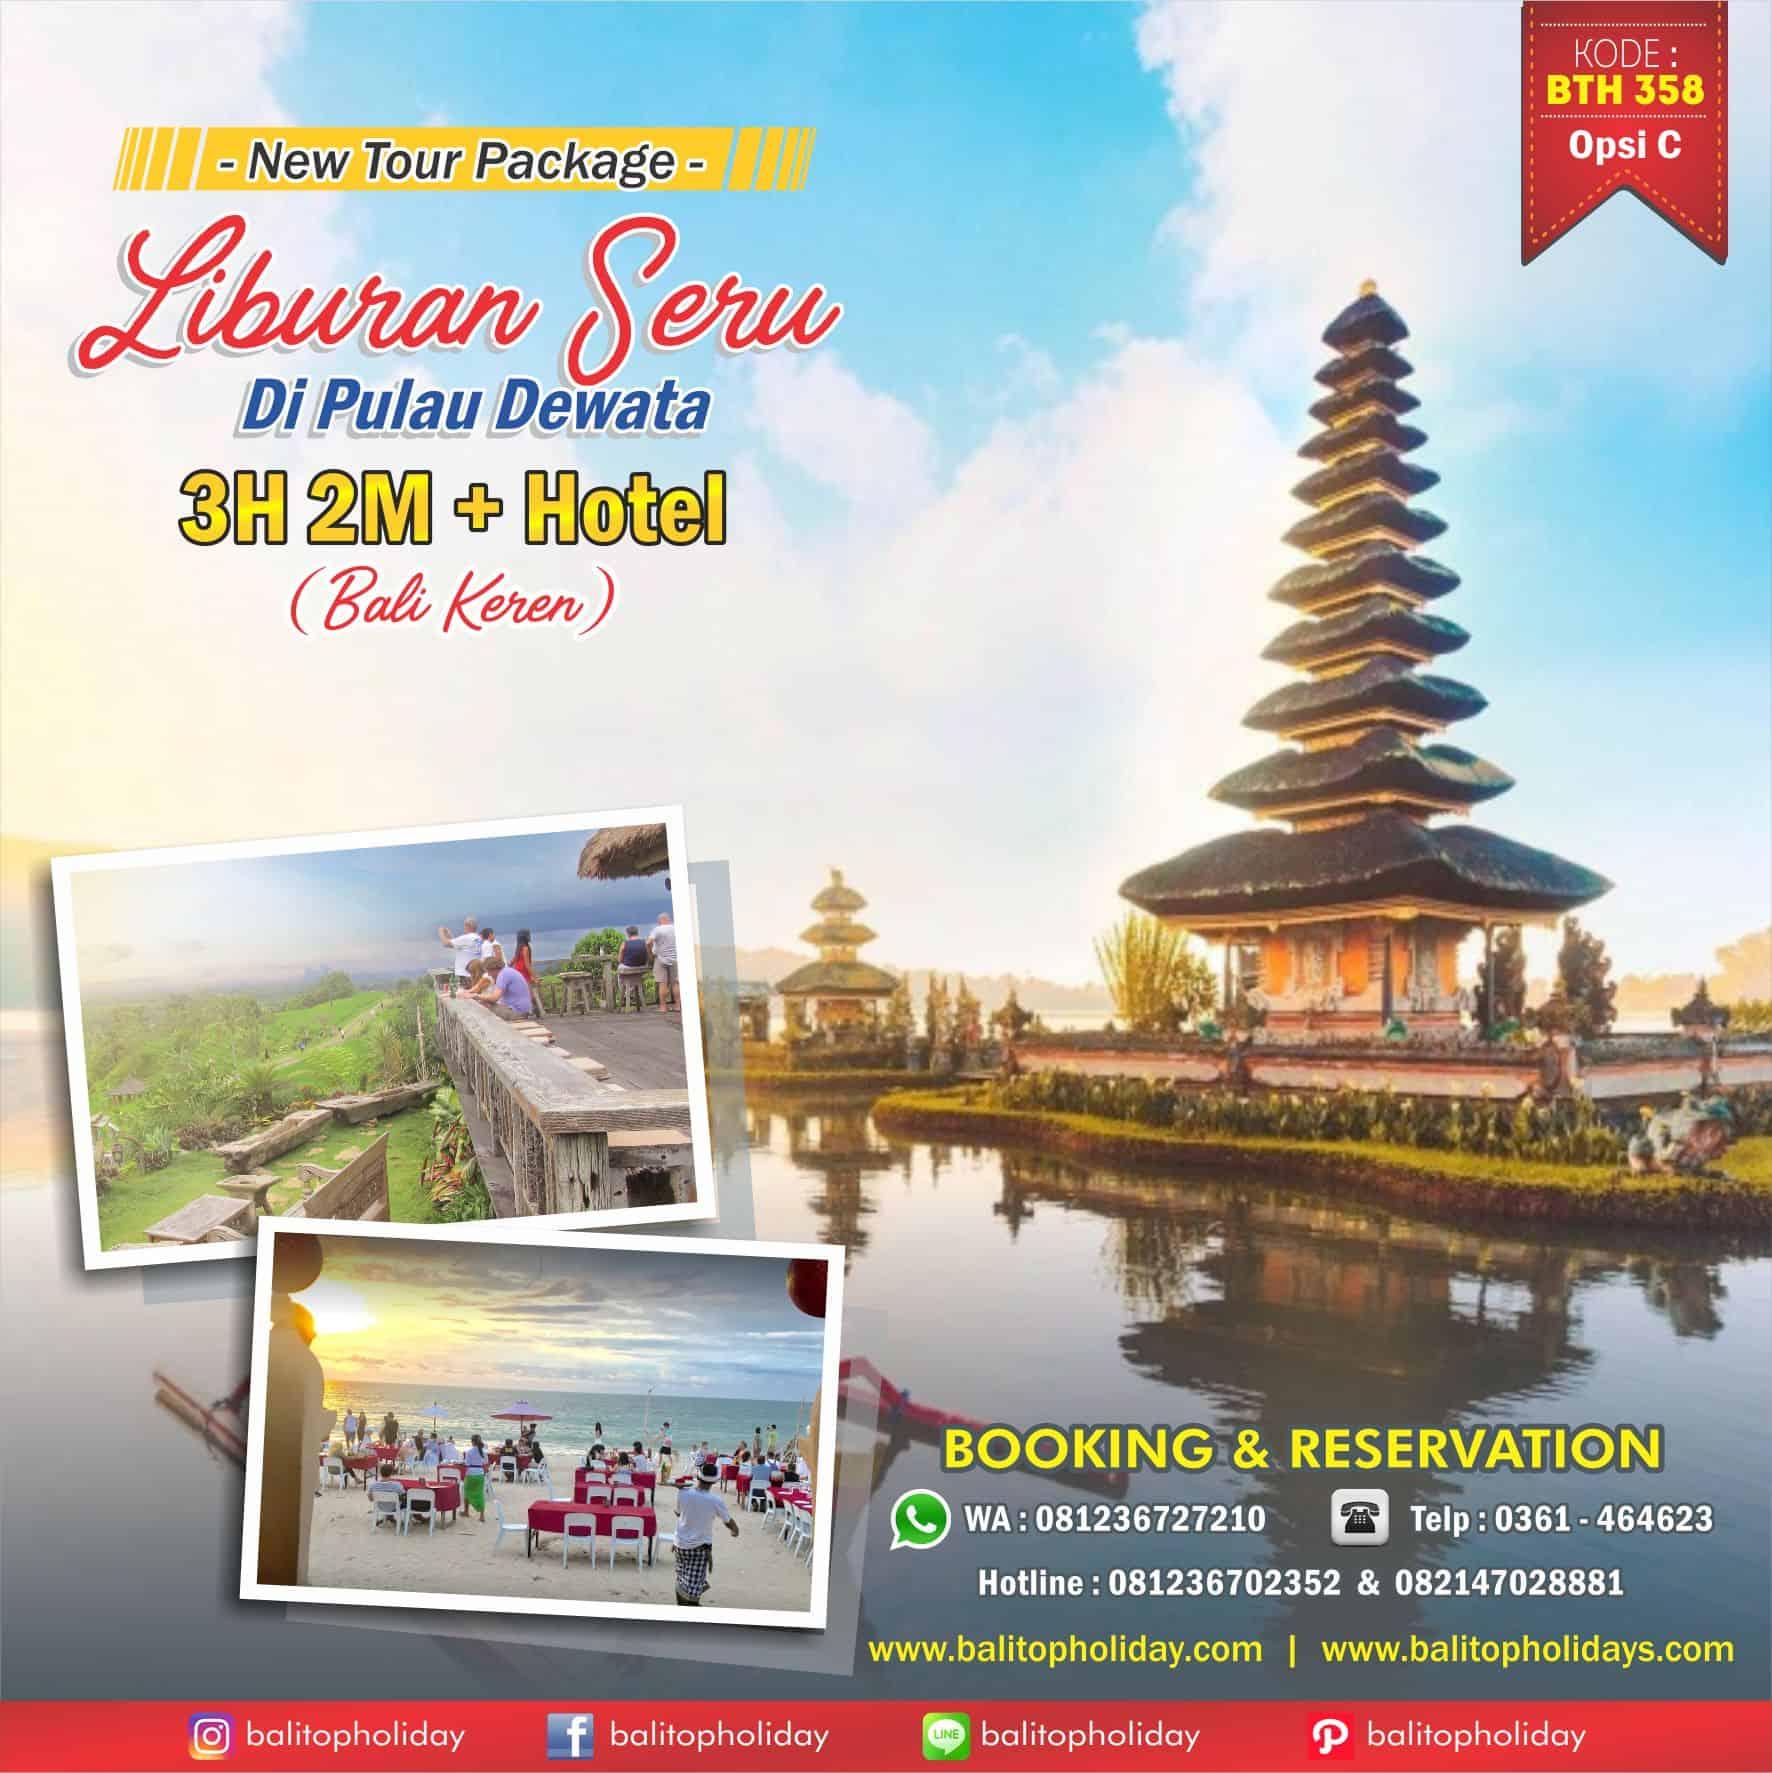 Paket Tour Bali 3H 2M